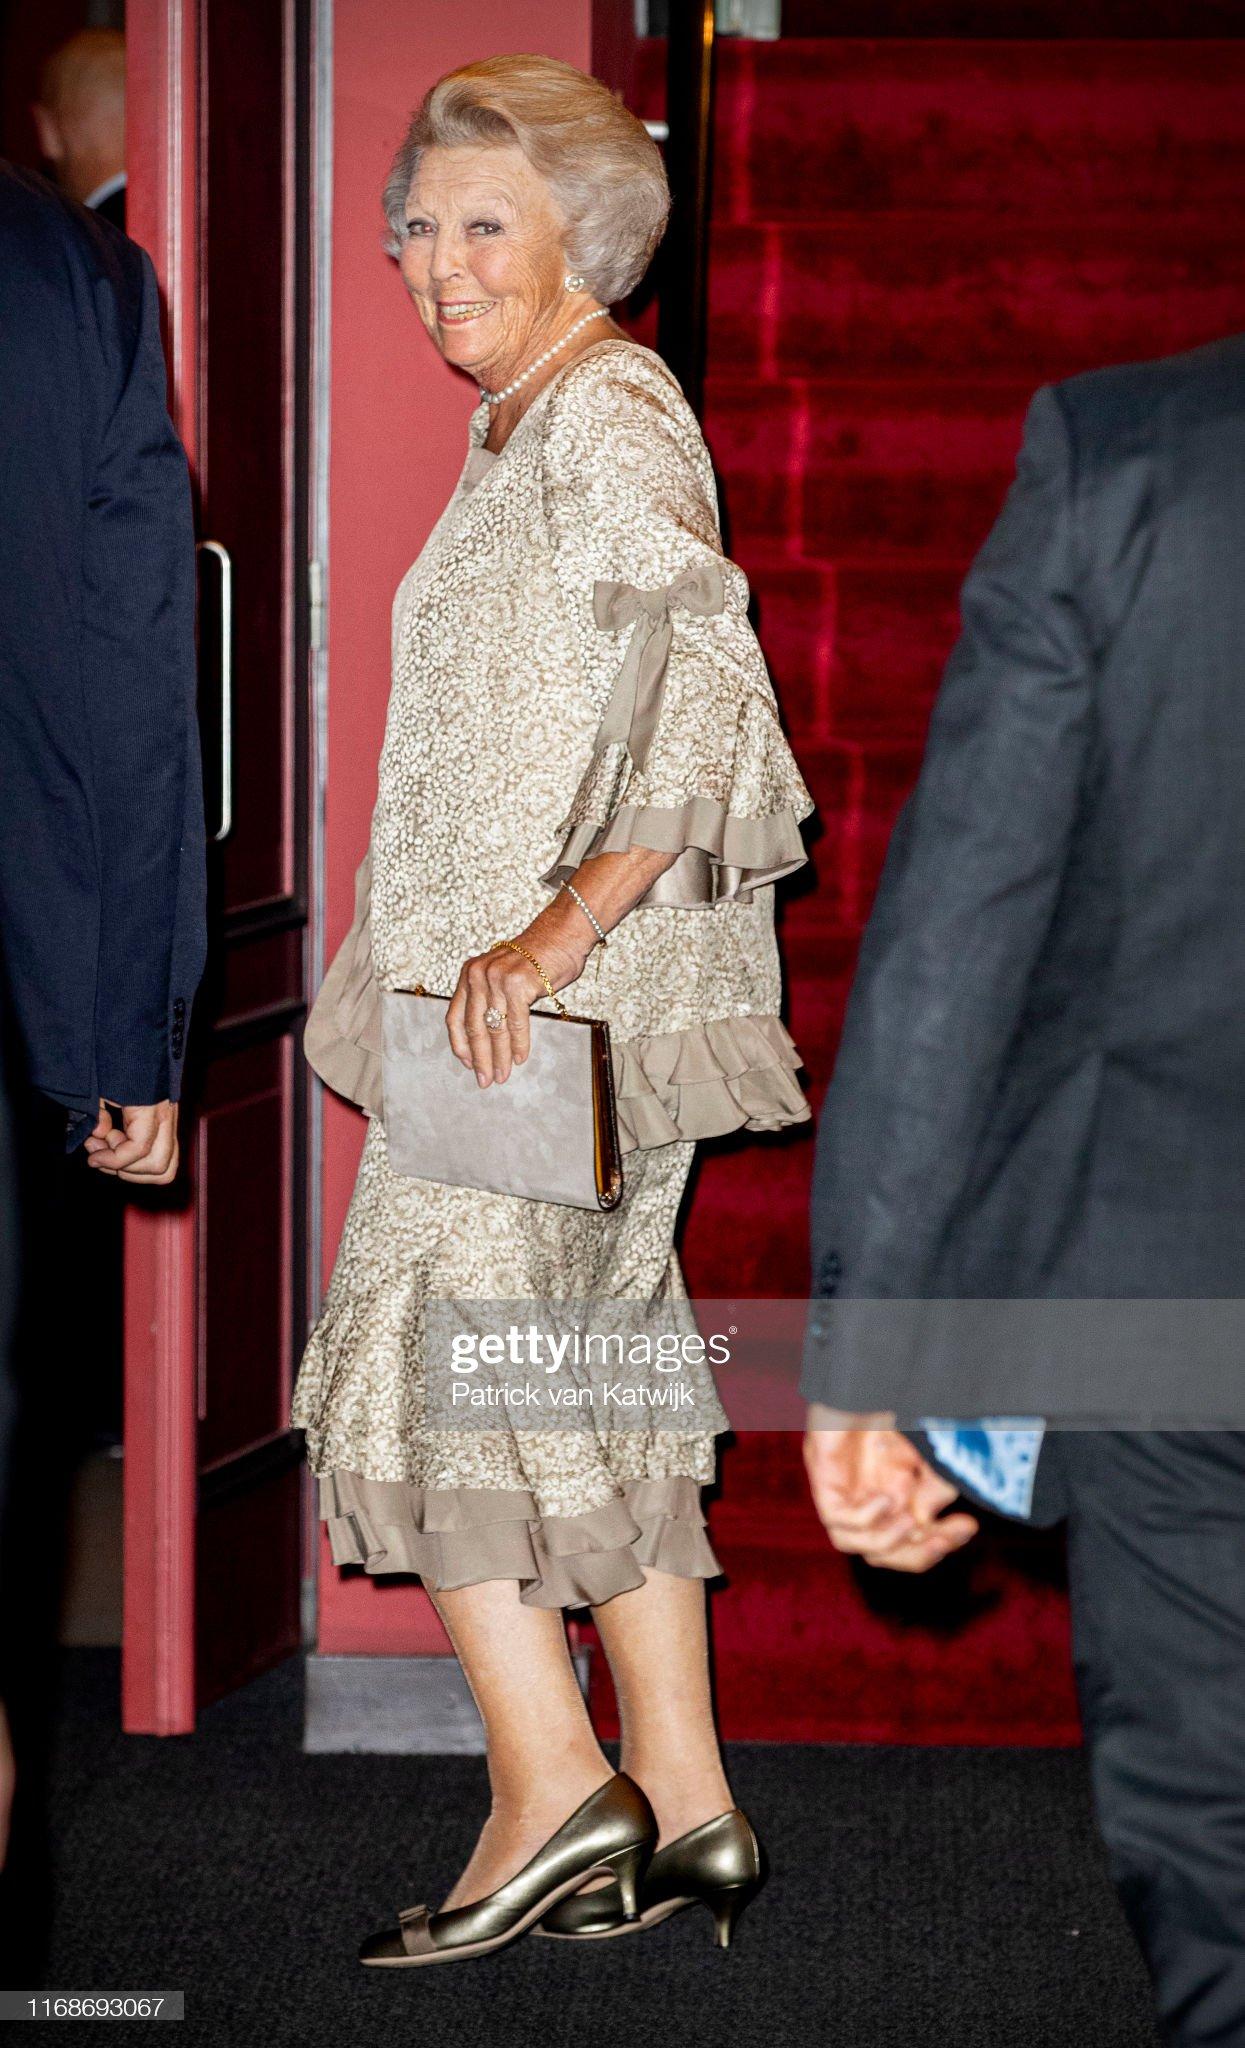 Dutch Royal Family Attends Princess Irene's Birthday : News Photo